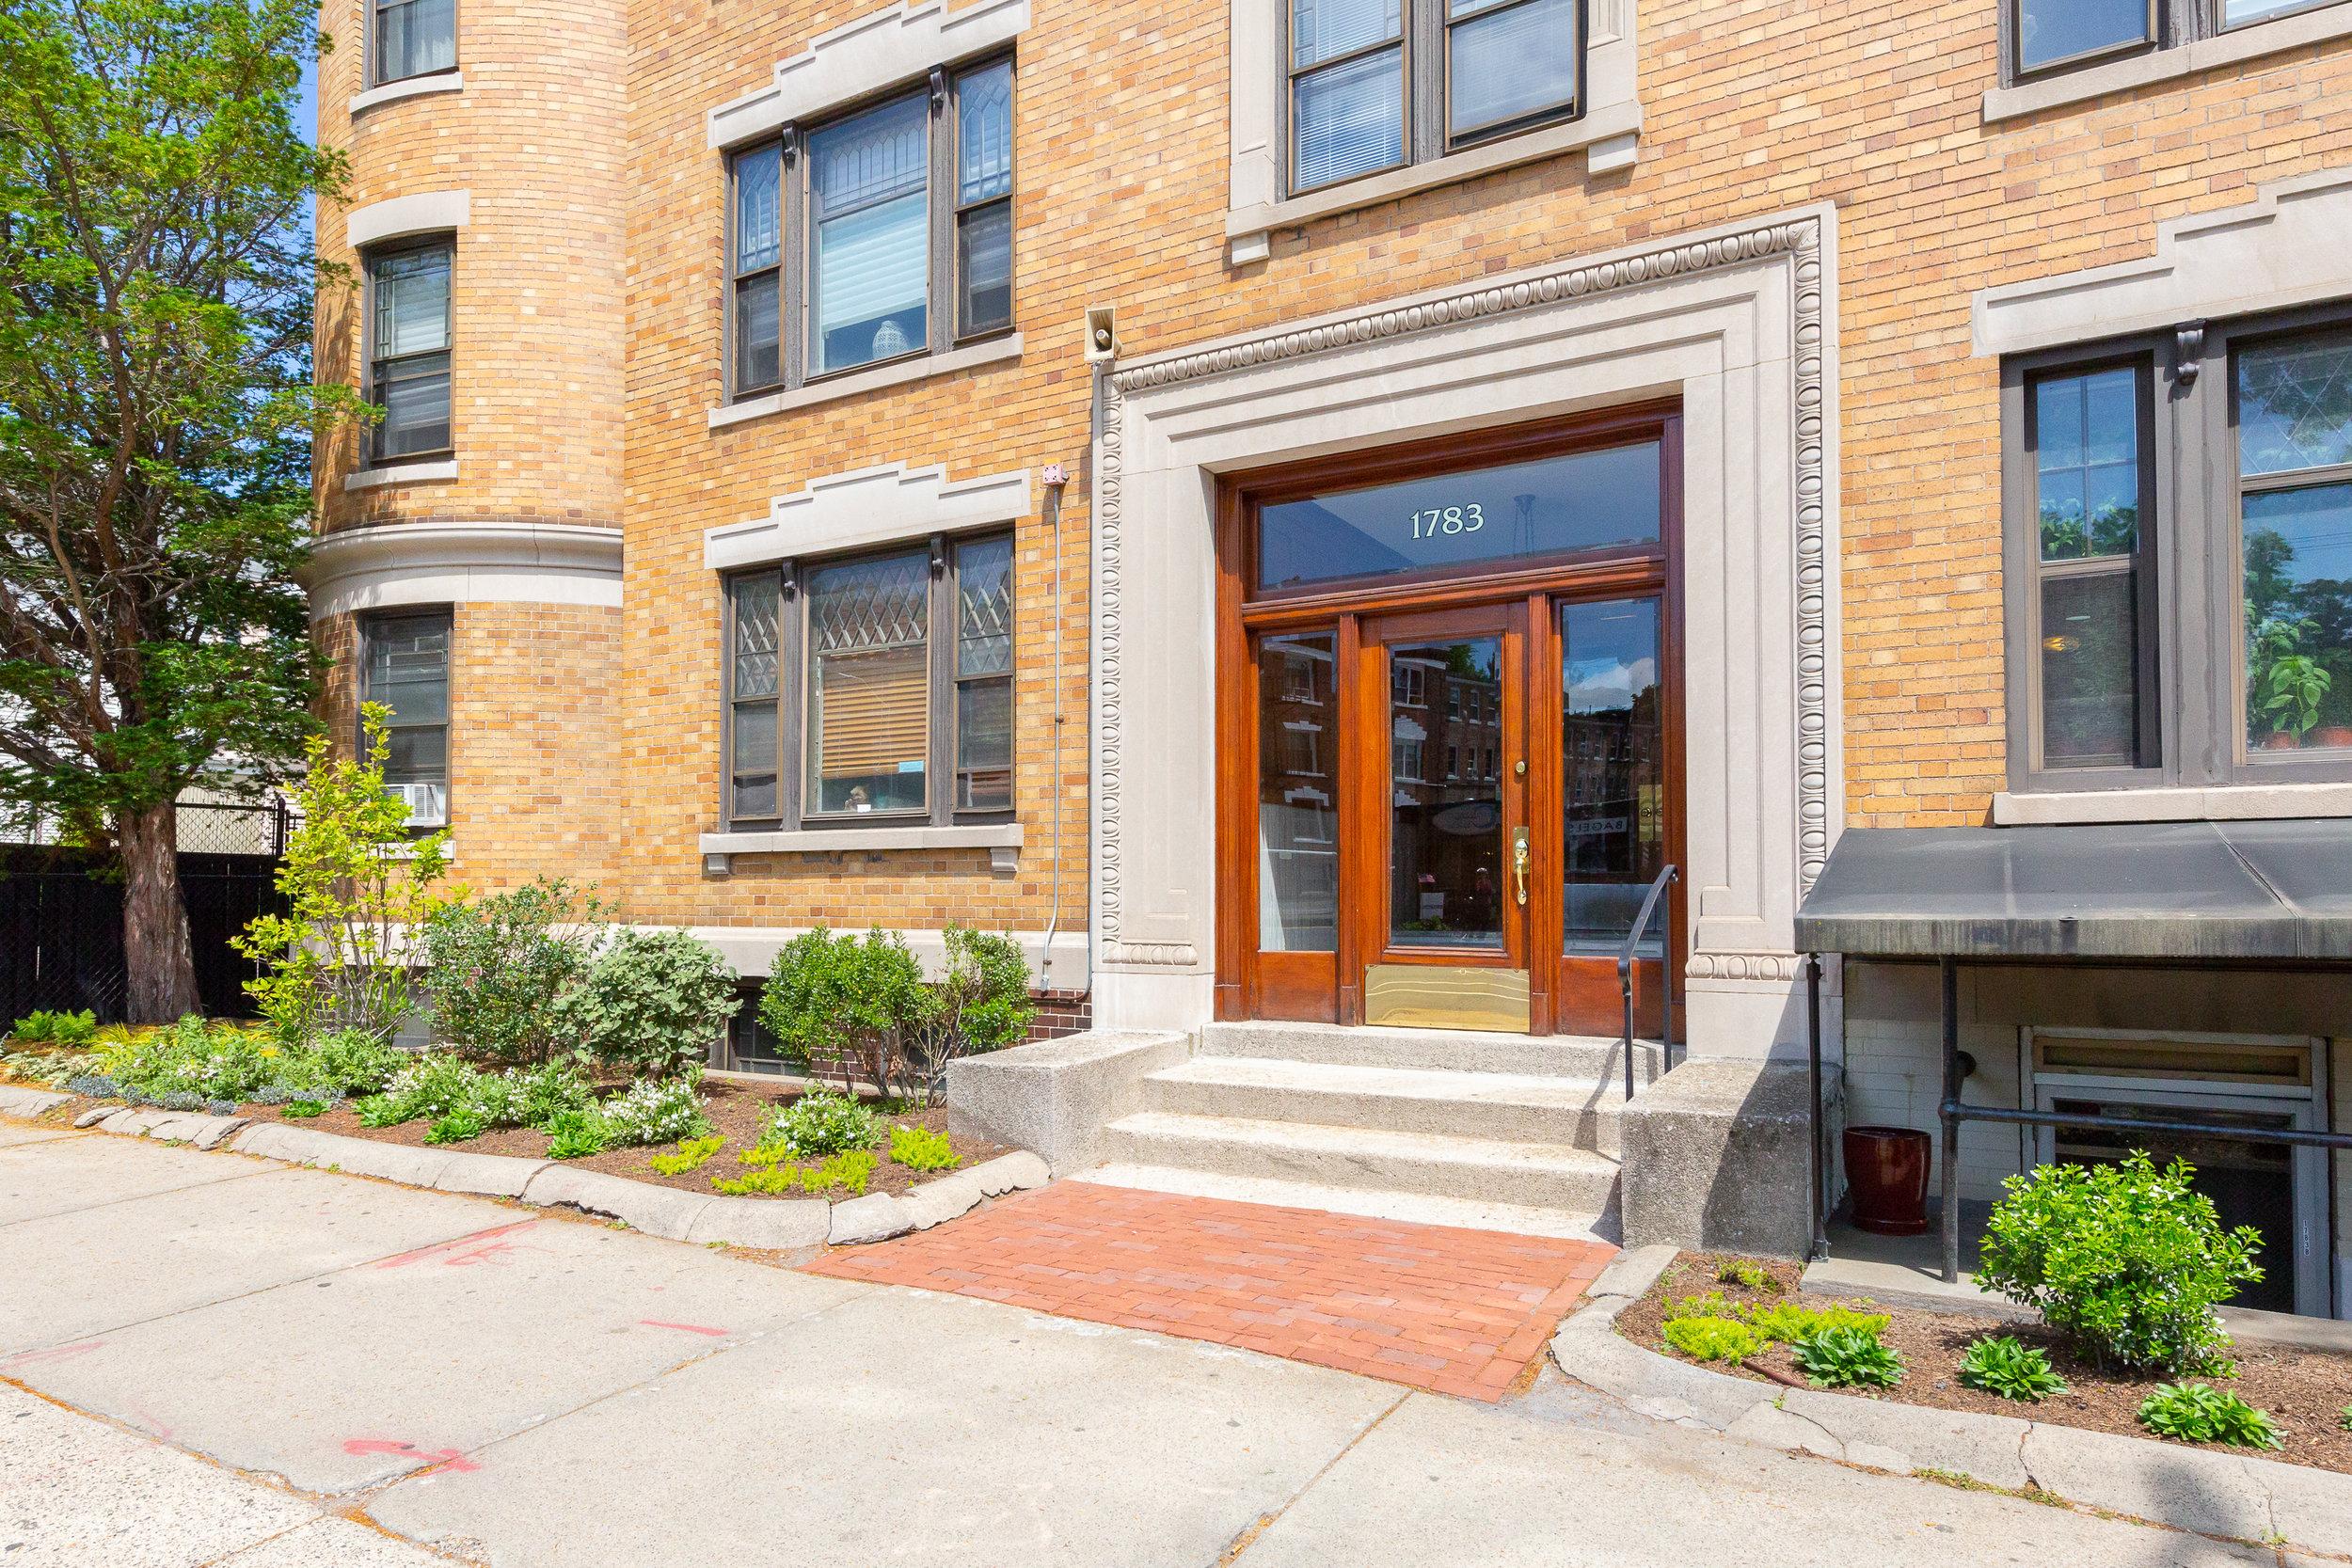 1783 Massachusetts Ave, Cambridge, MA_Property-Precision-3.jpg